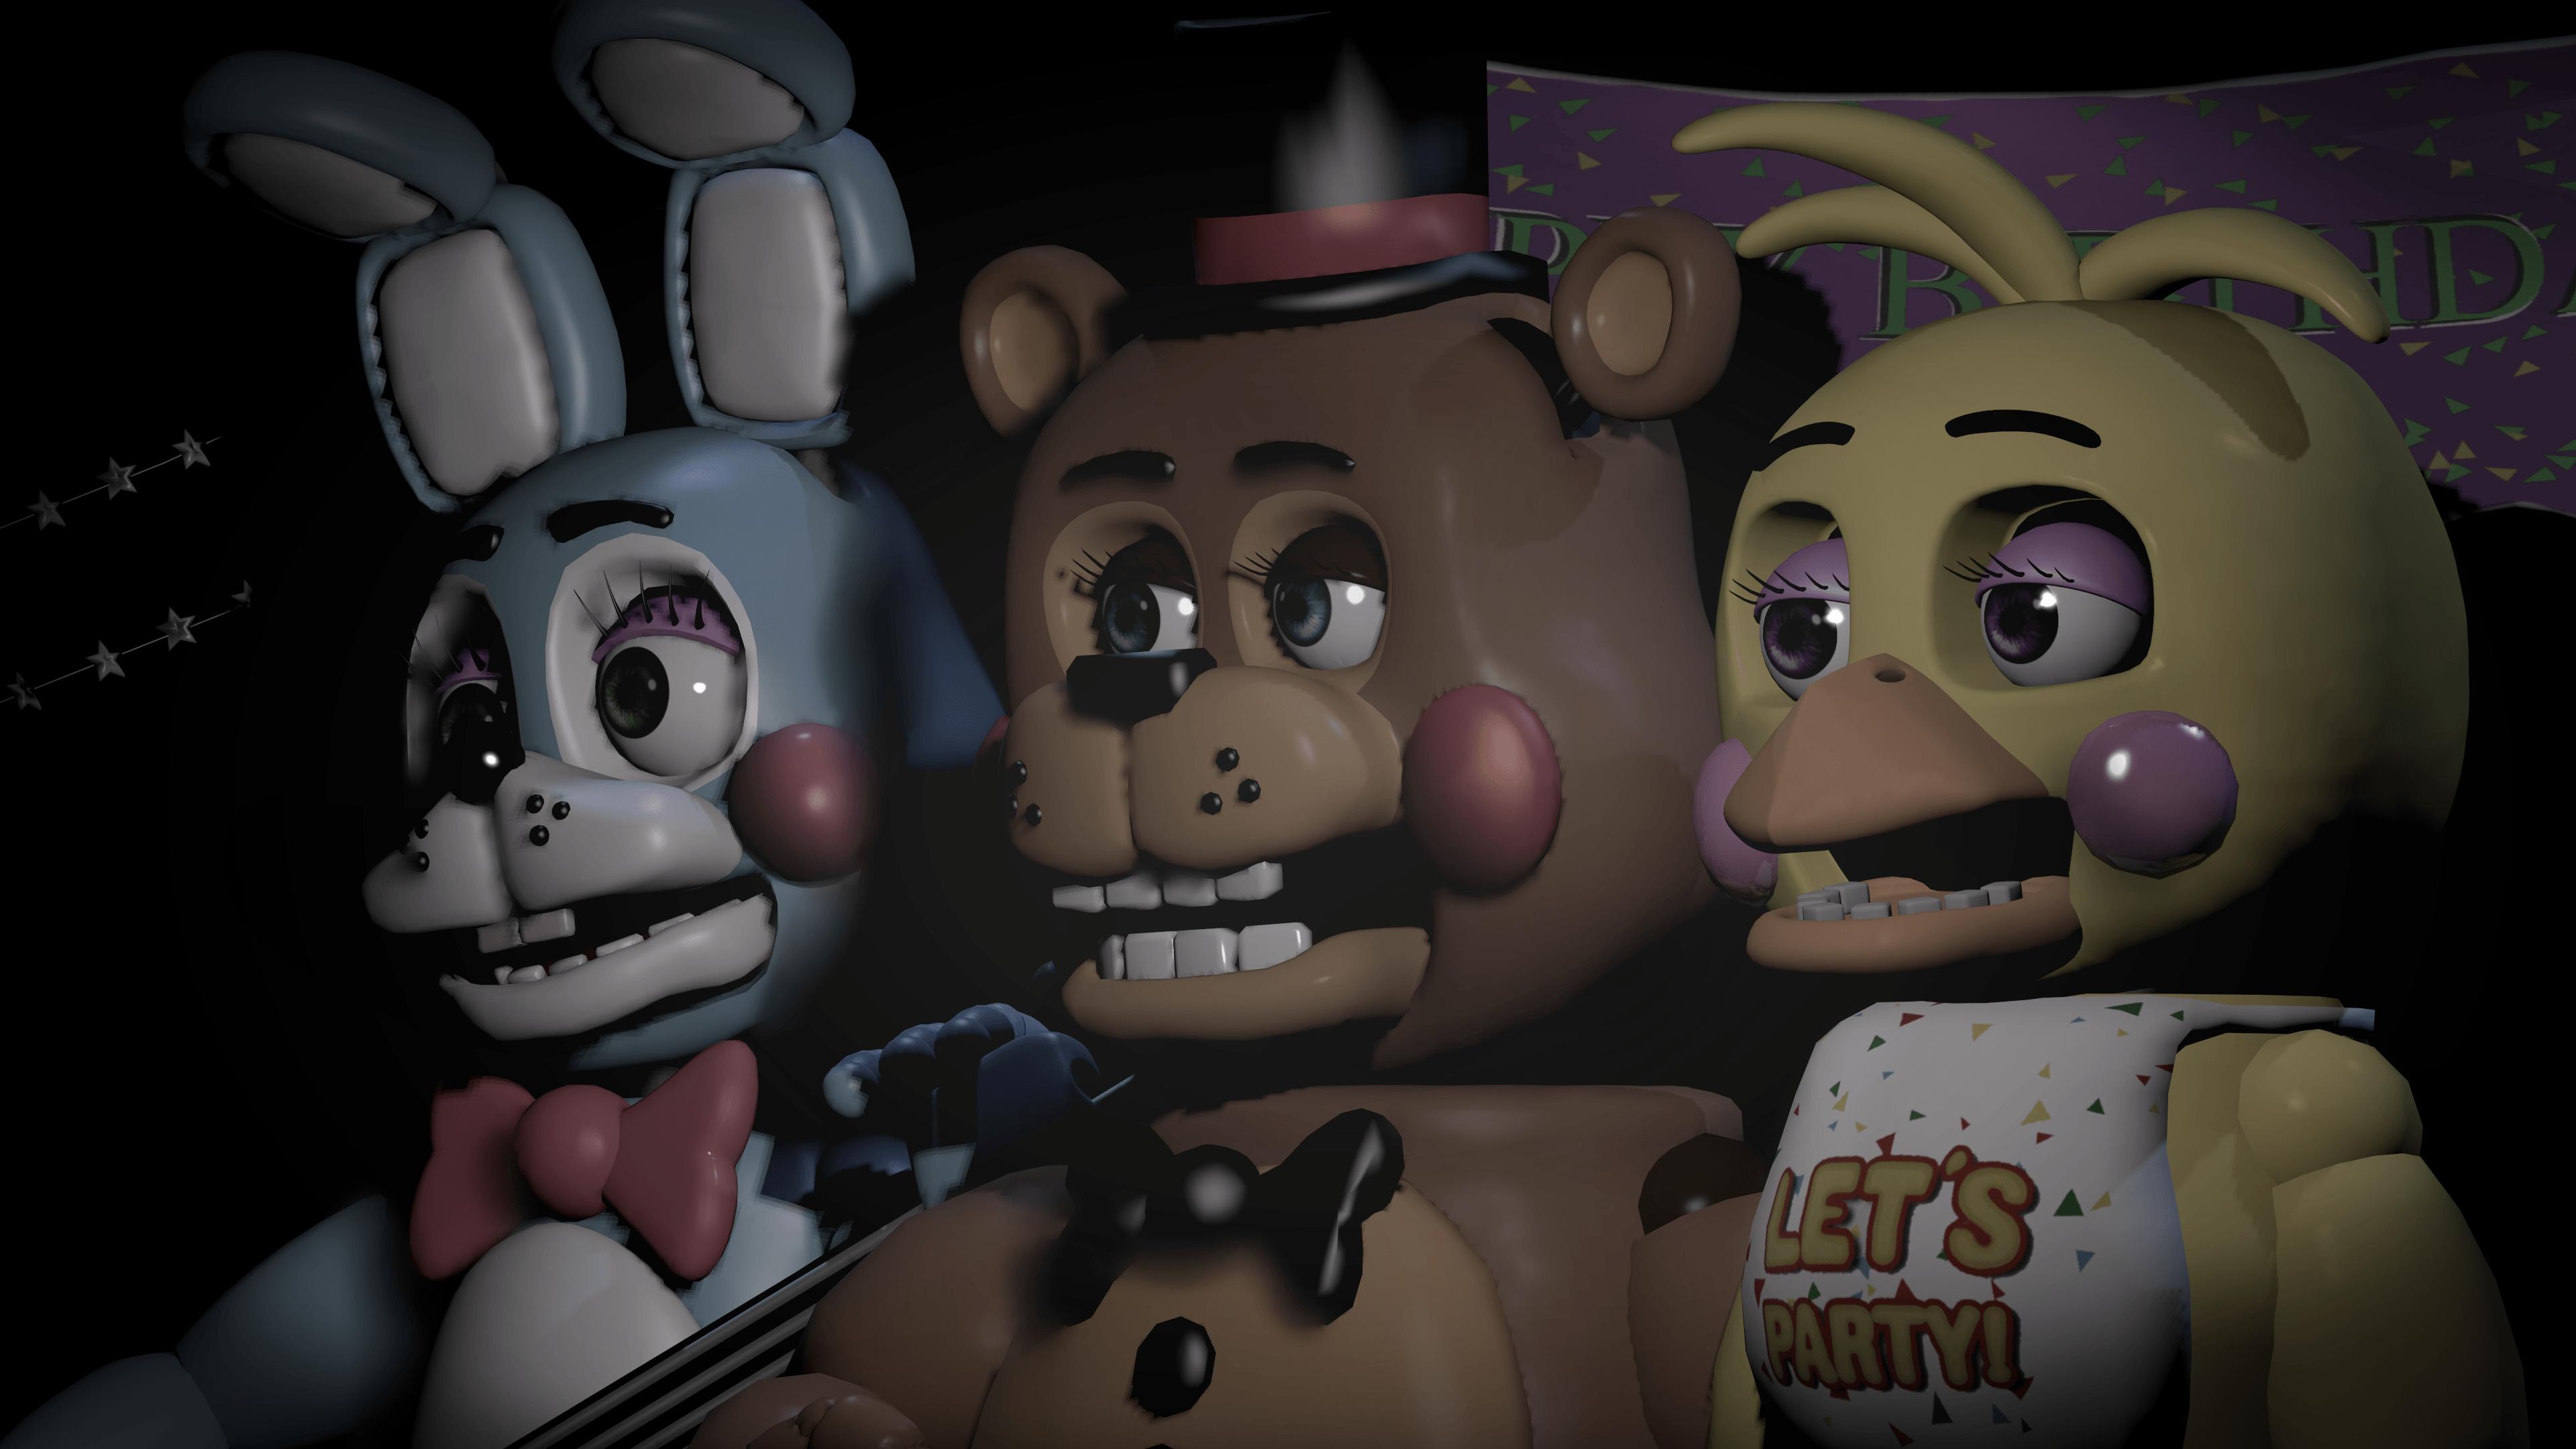 Five Nights at Freddy/'s image pour le g\u00e2teau